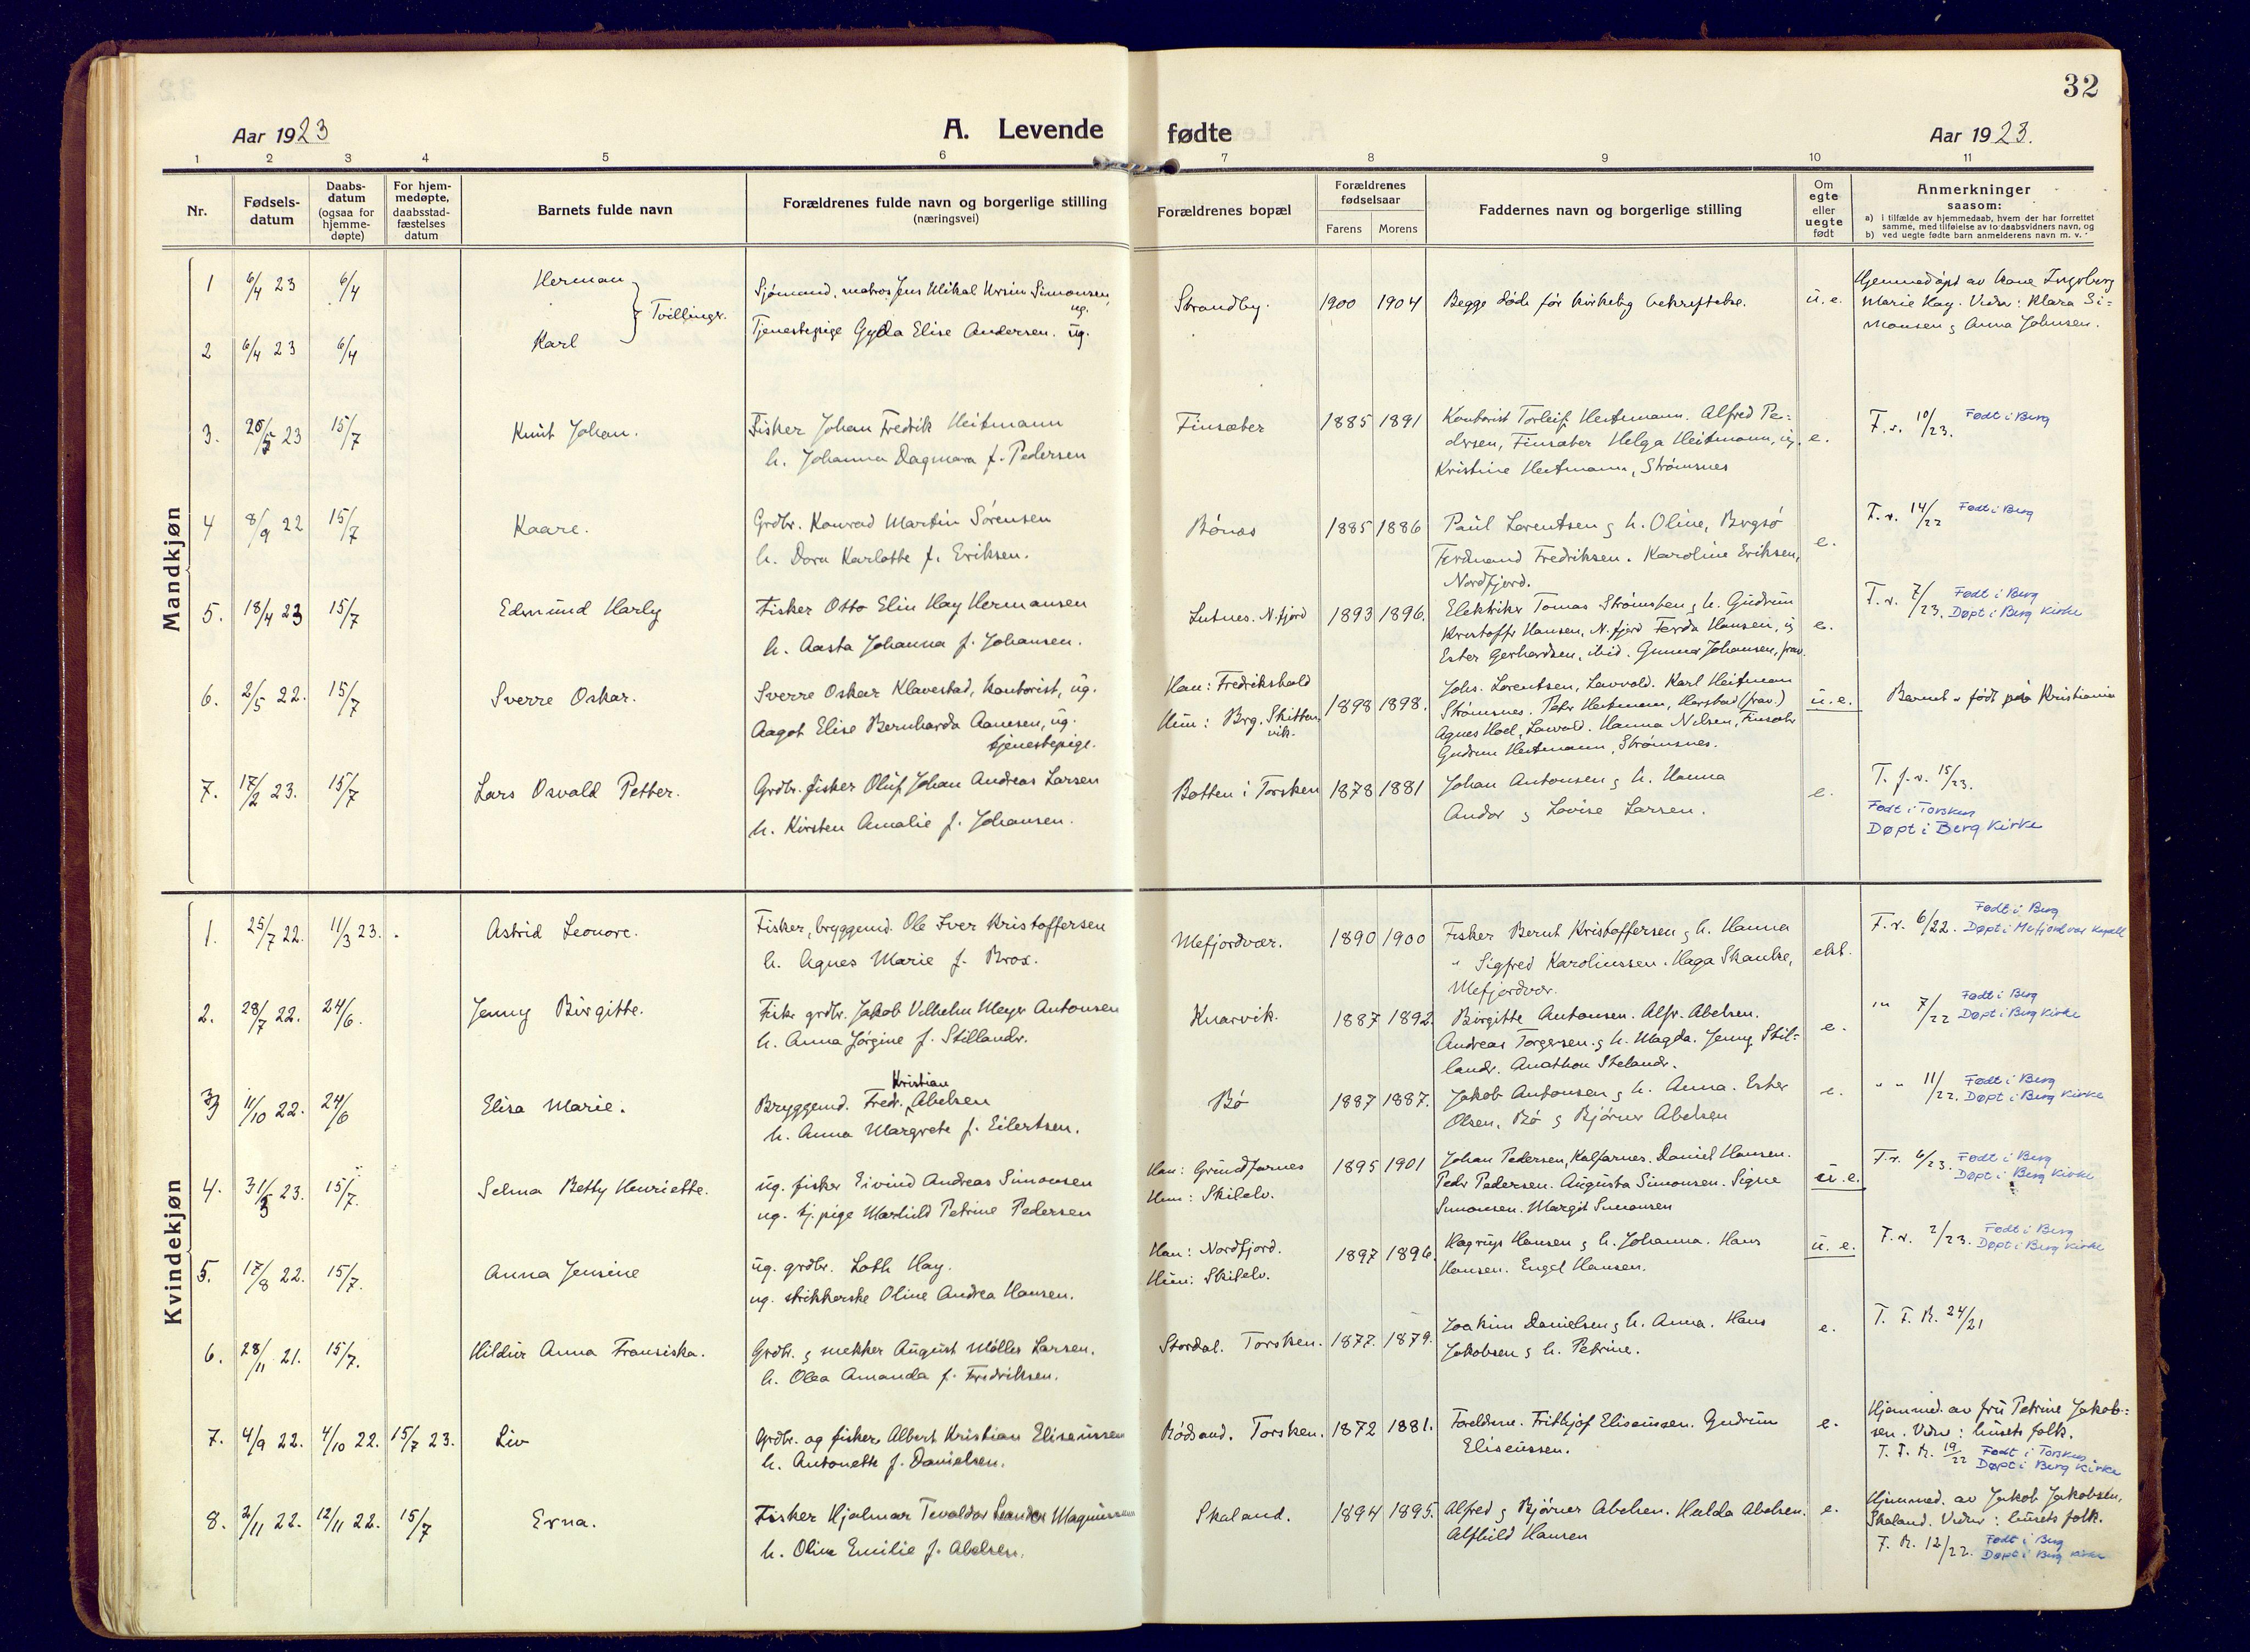 SATØ, Mefjord/Berg sokneprestkontor, G/Ga/Gaa: Ministerialbok nr. 9, 1916-1928, s. 32